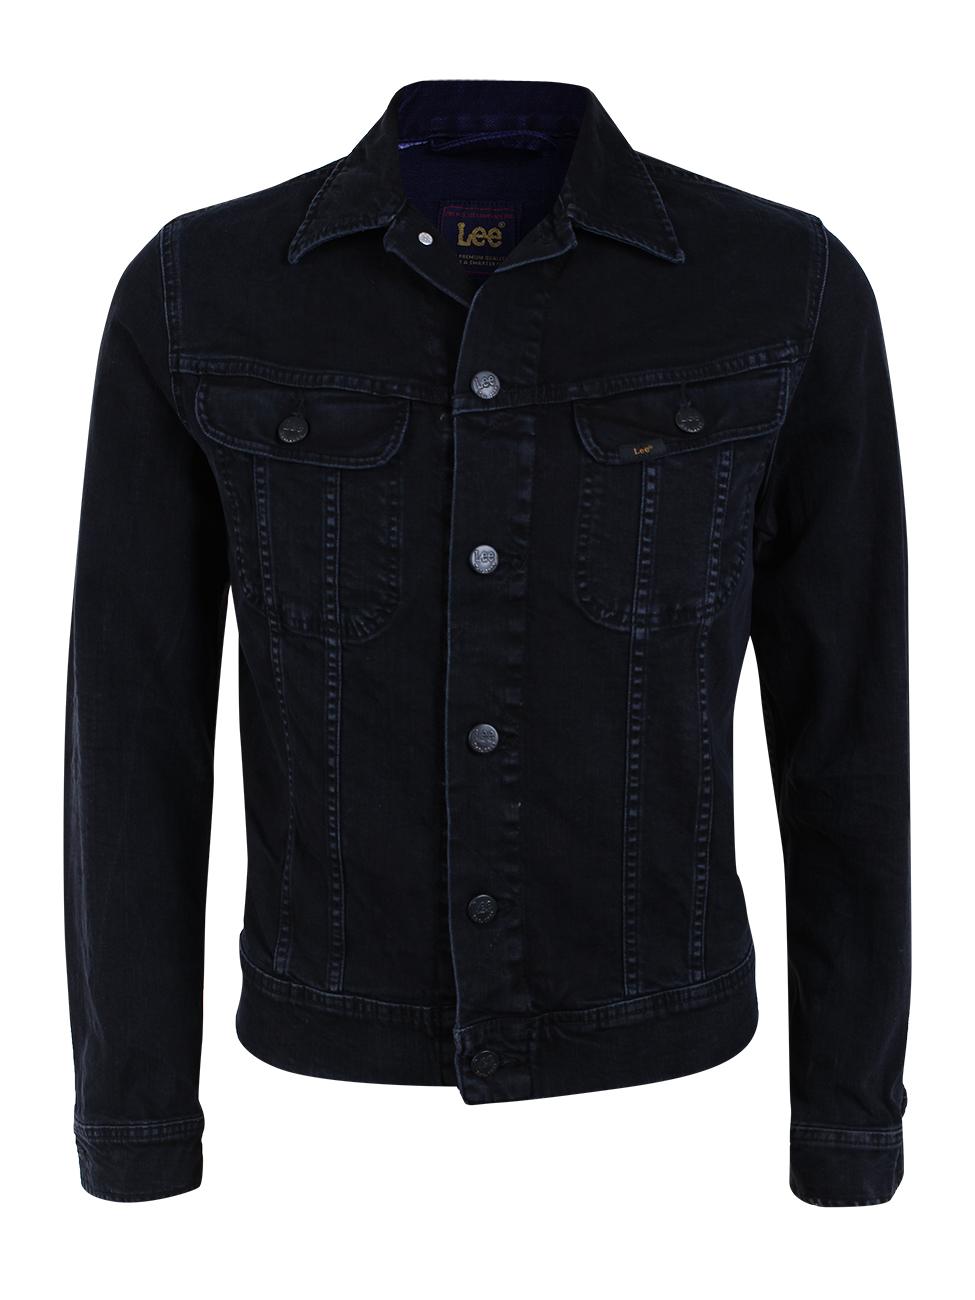 lee herren jeansjacke slim rider slim fit schwarz dark raven ebay. Black Bedroom Furniture Sets. Home Design Ideas